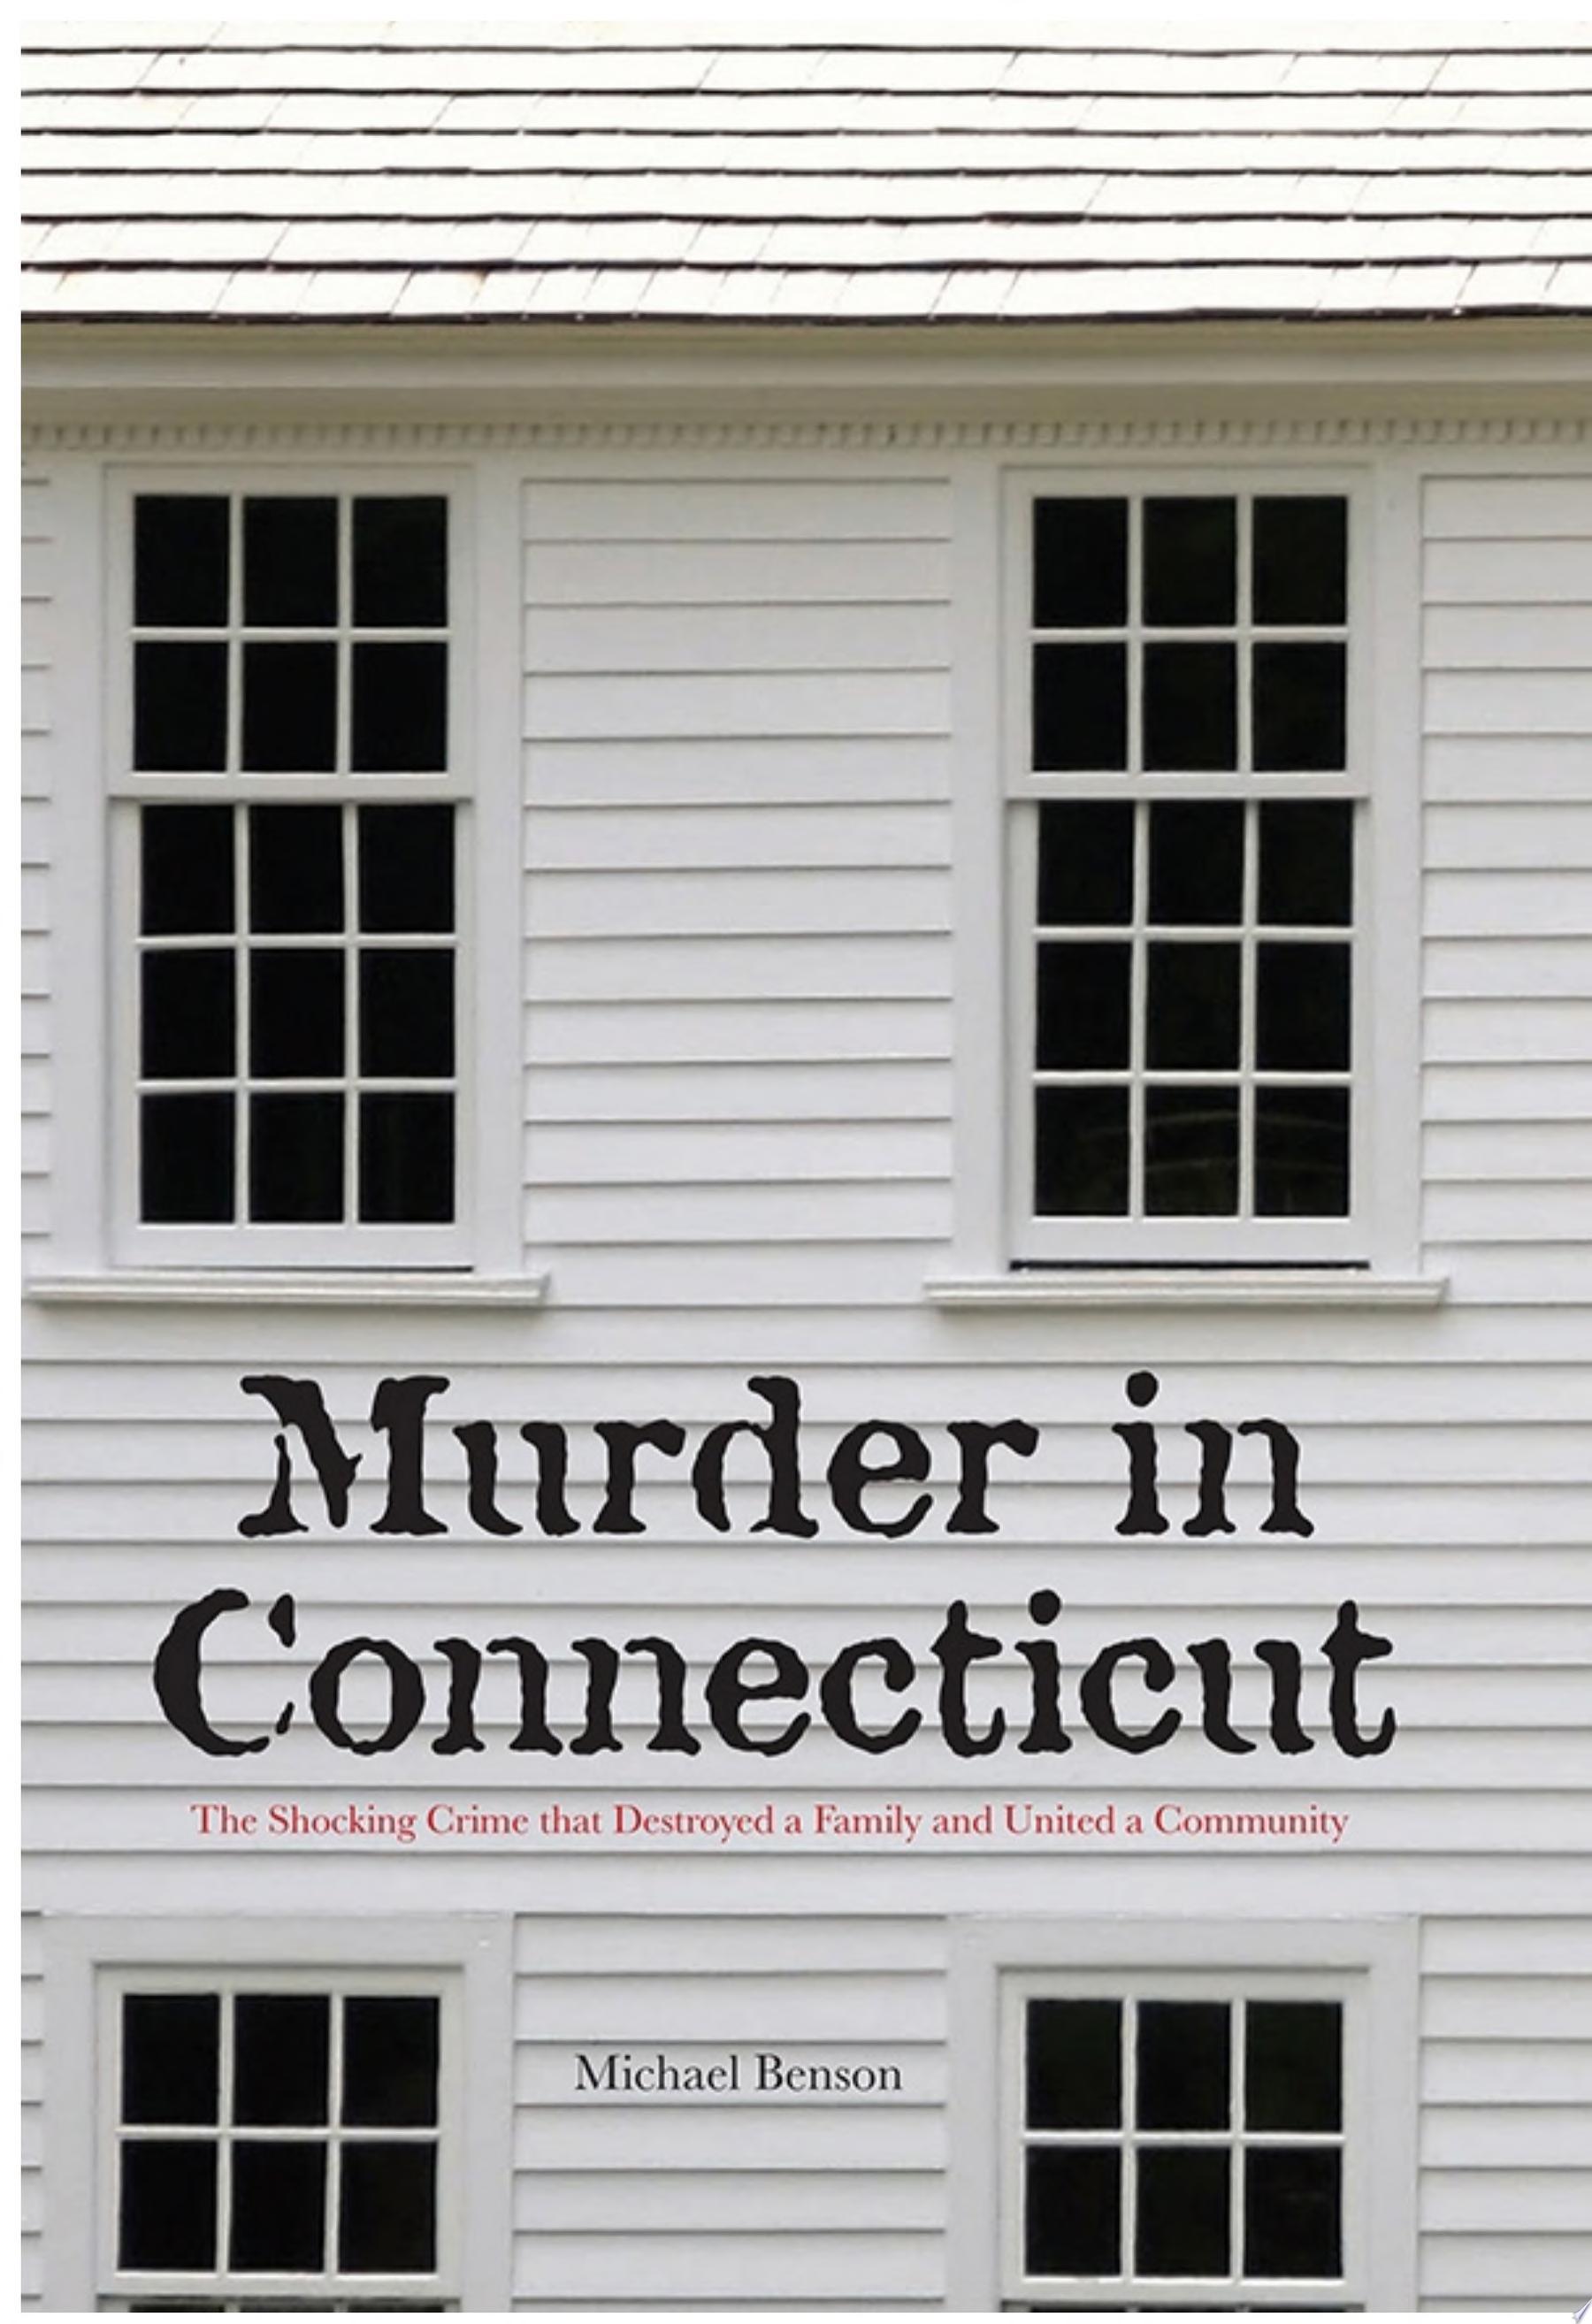 Murder in Connecticut